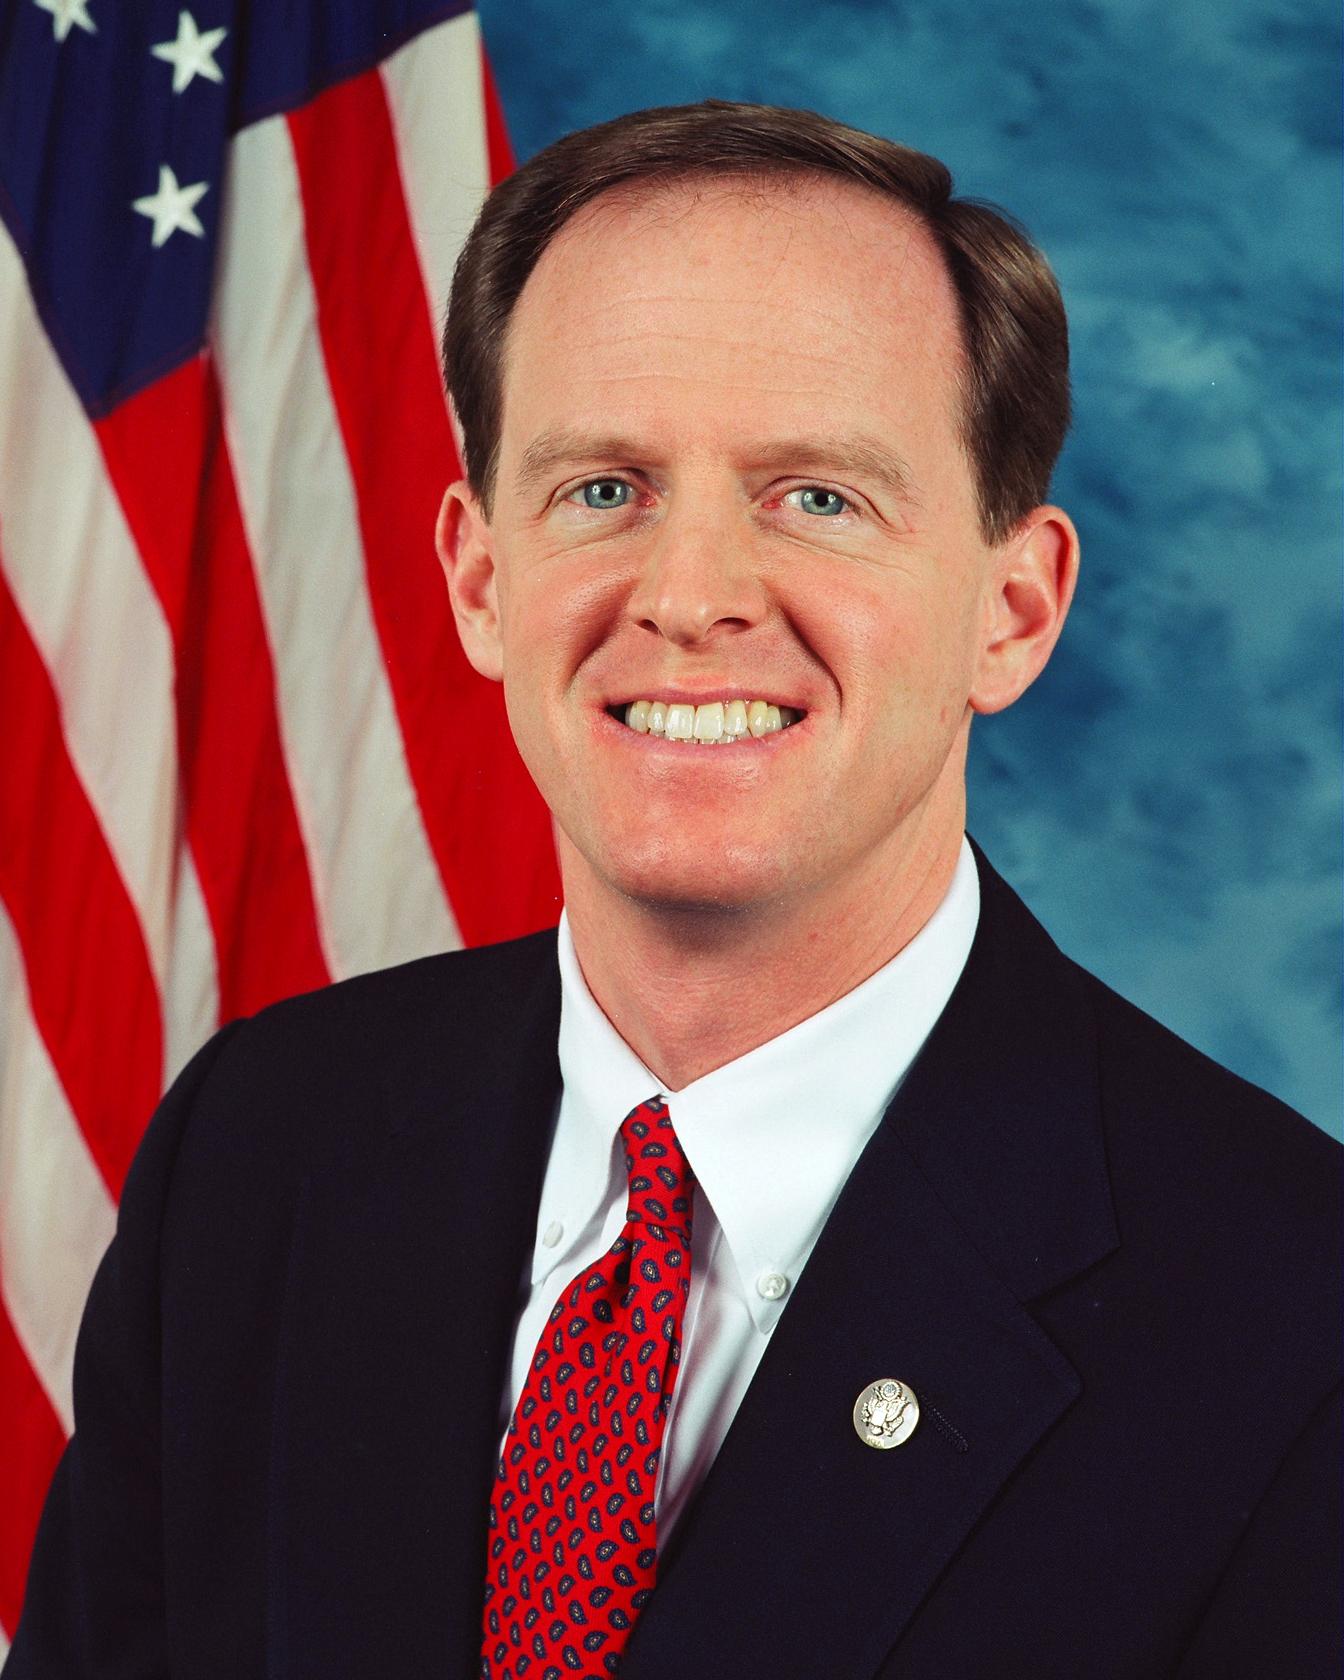 2010 United States Senate election in Pennsylvania - Wikipedia